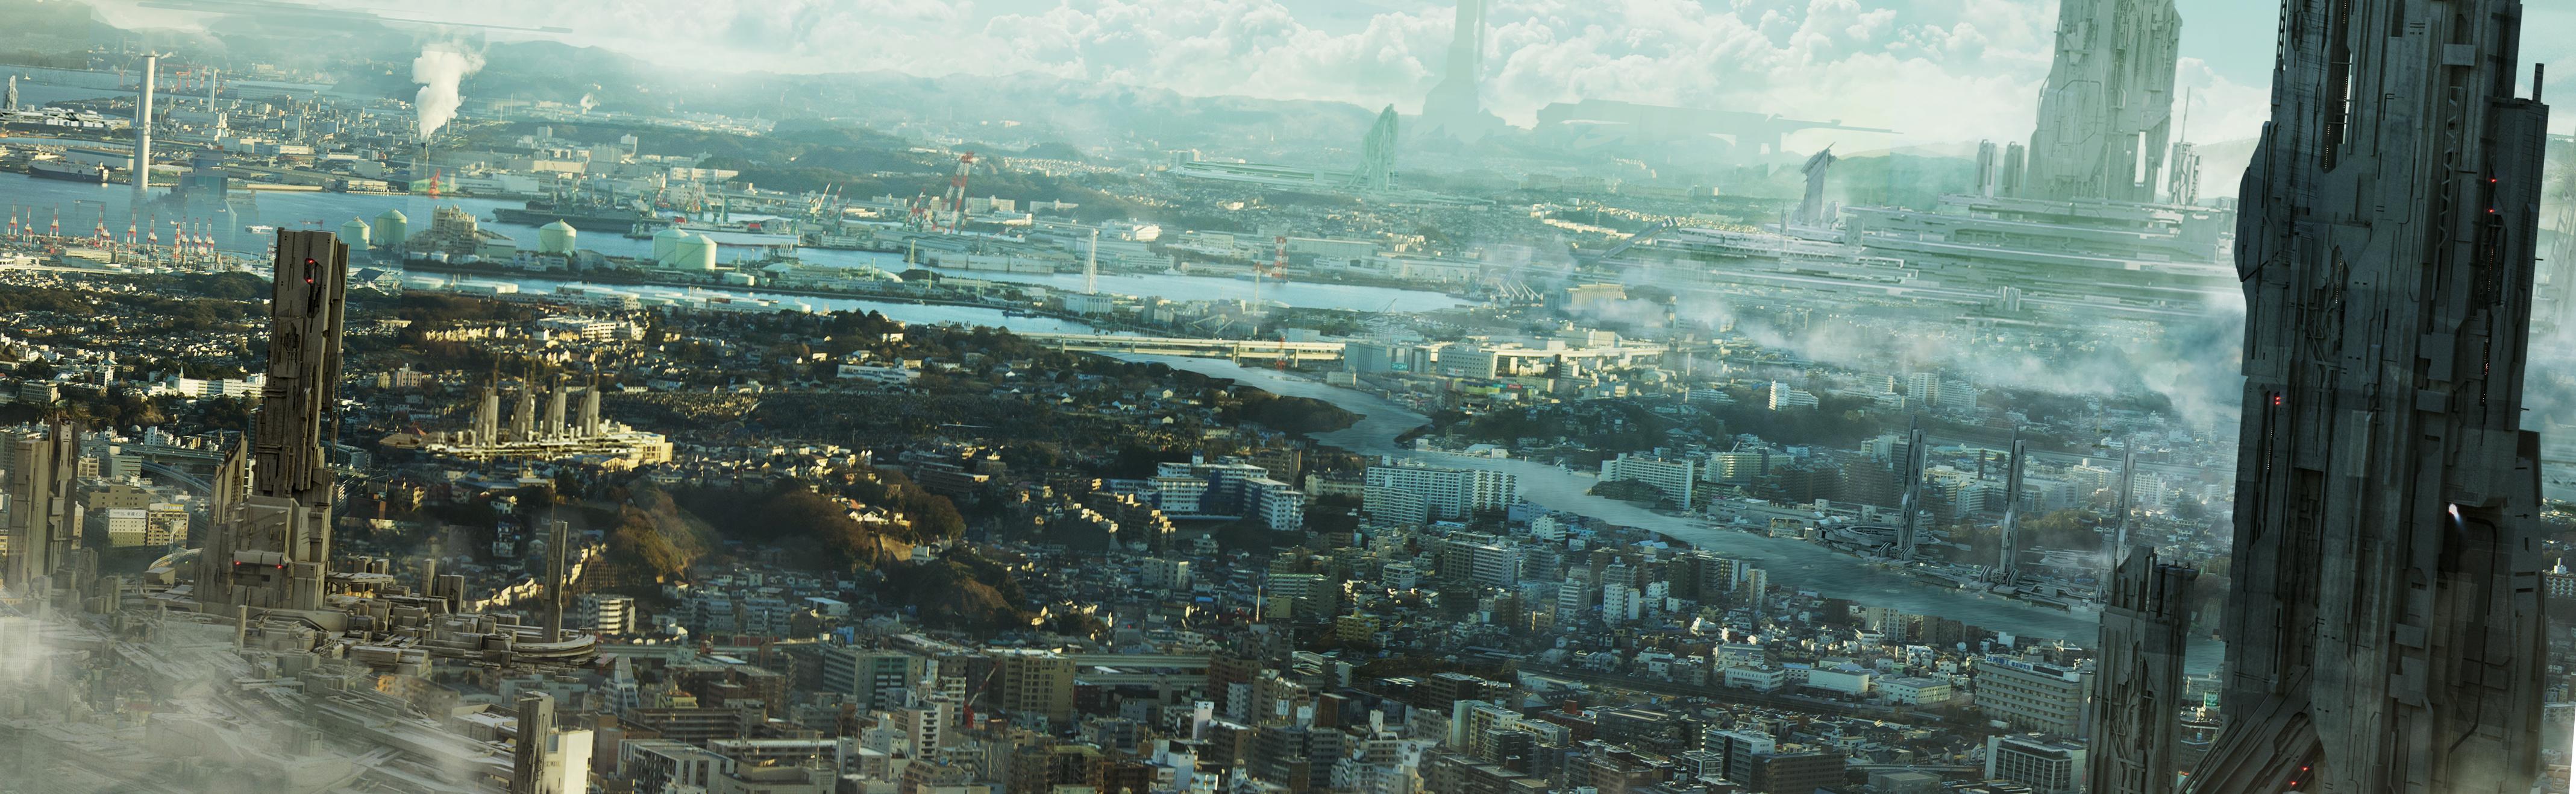 city03_5